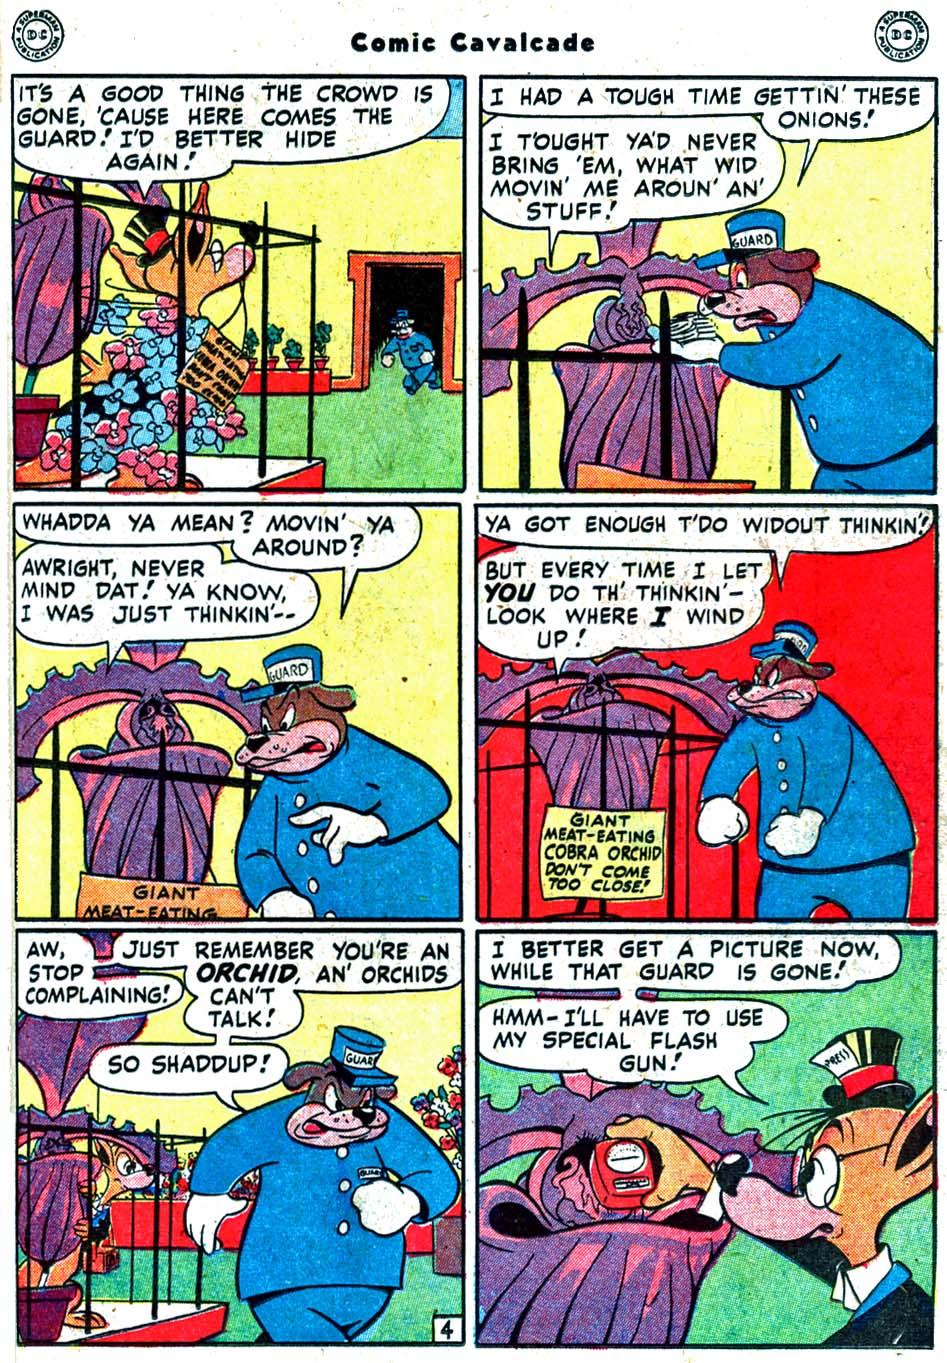 Comic Cavalcade issue 32 - Page 27